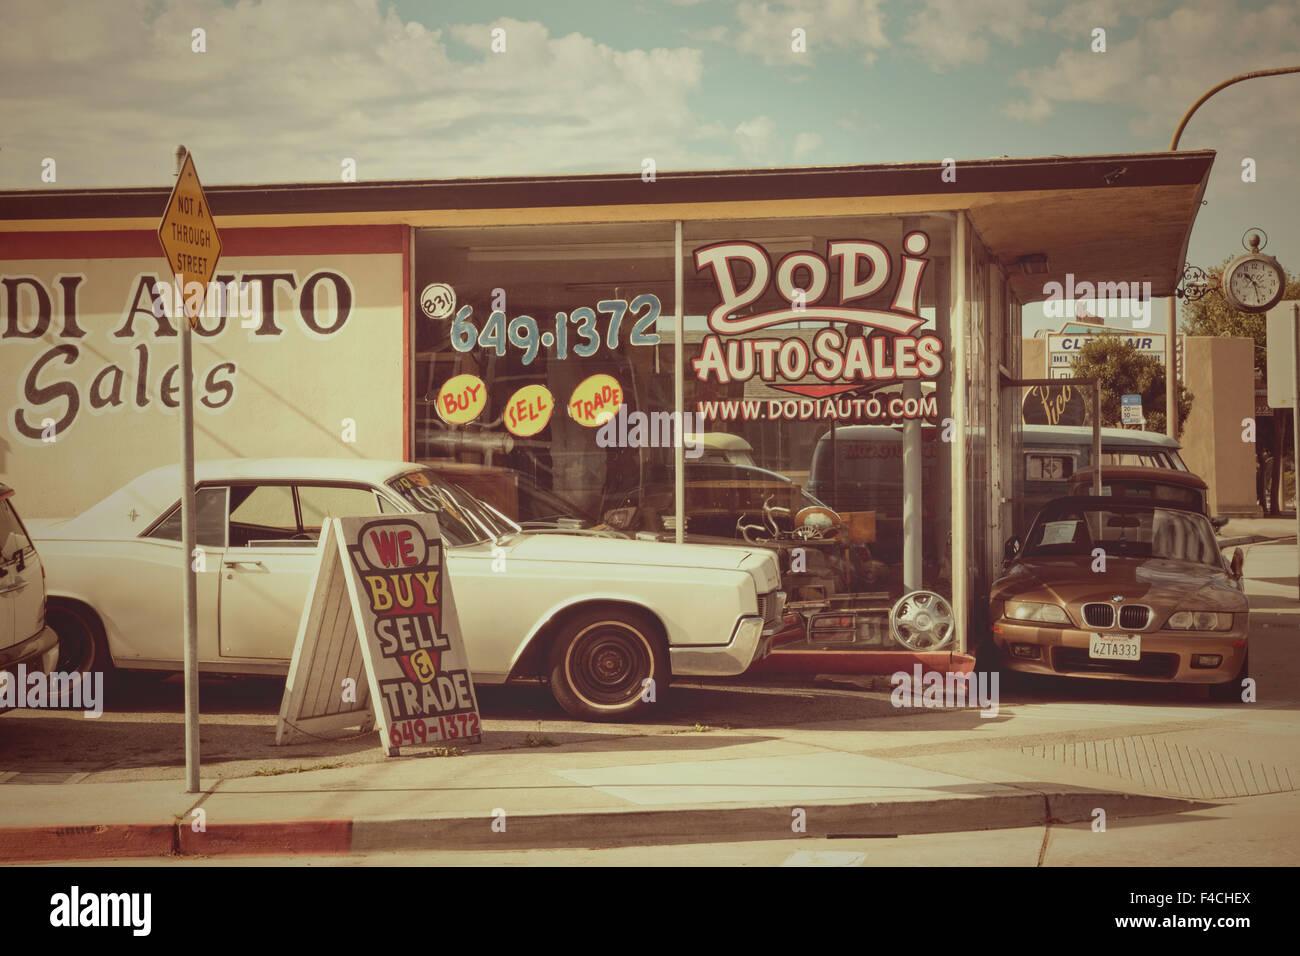 Dodi Auto sales Monterey California USA Stock Photo: 88787634 - Alamy